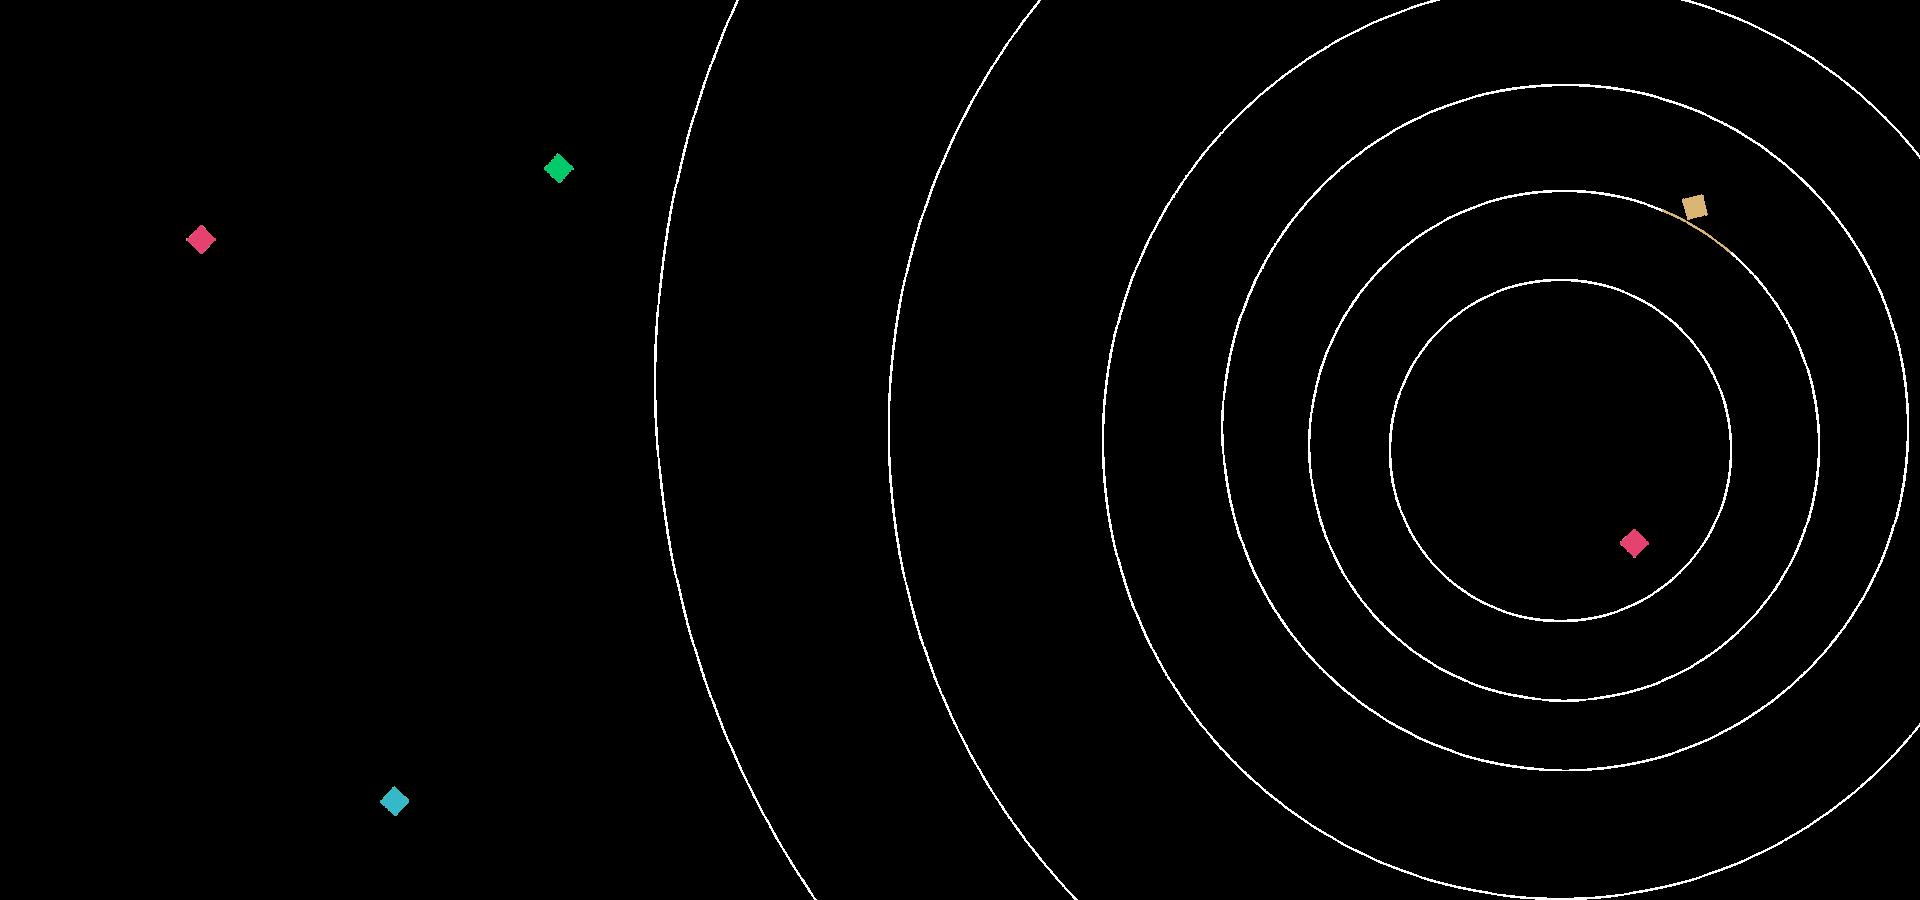 pattern_background7